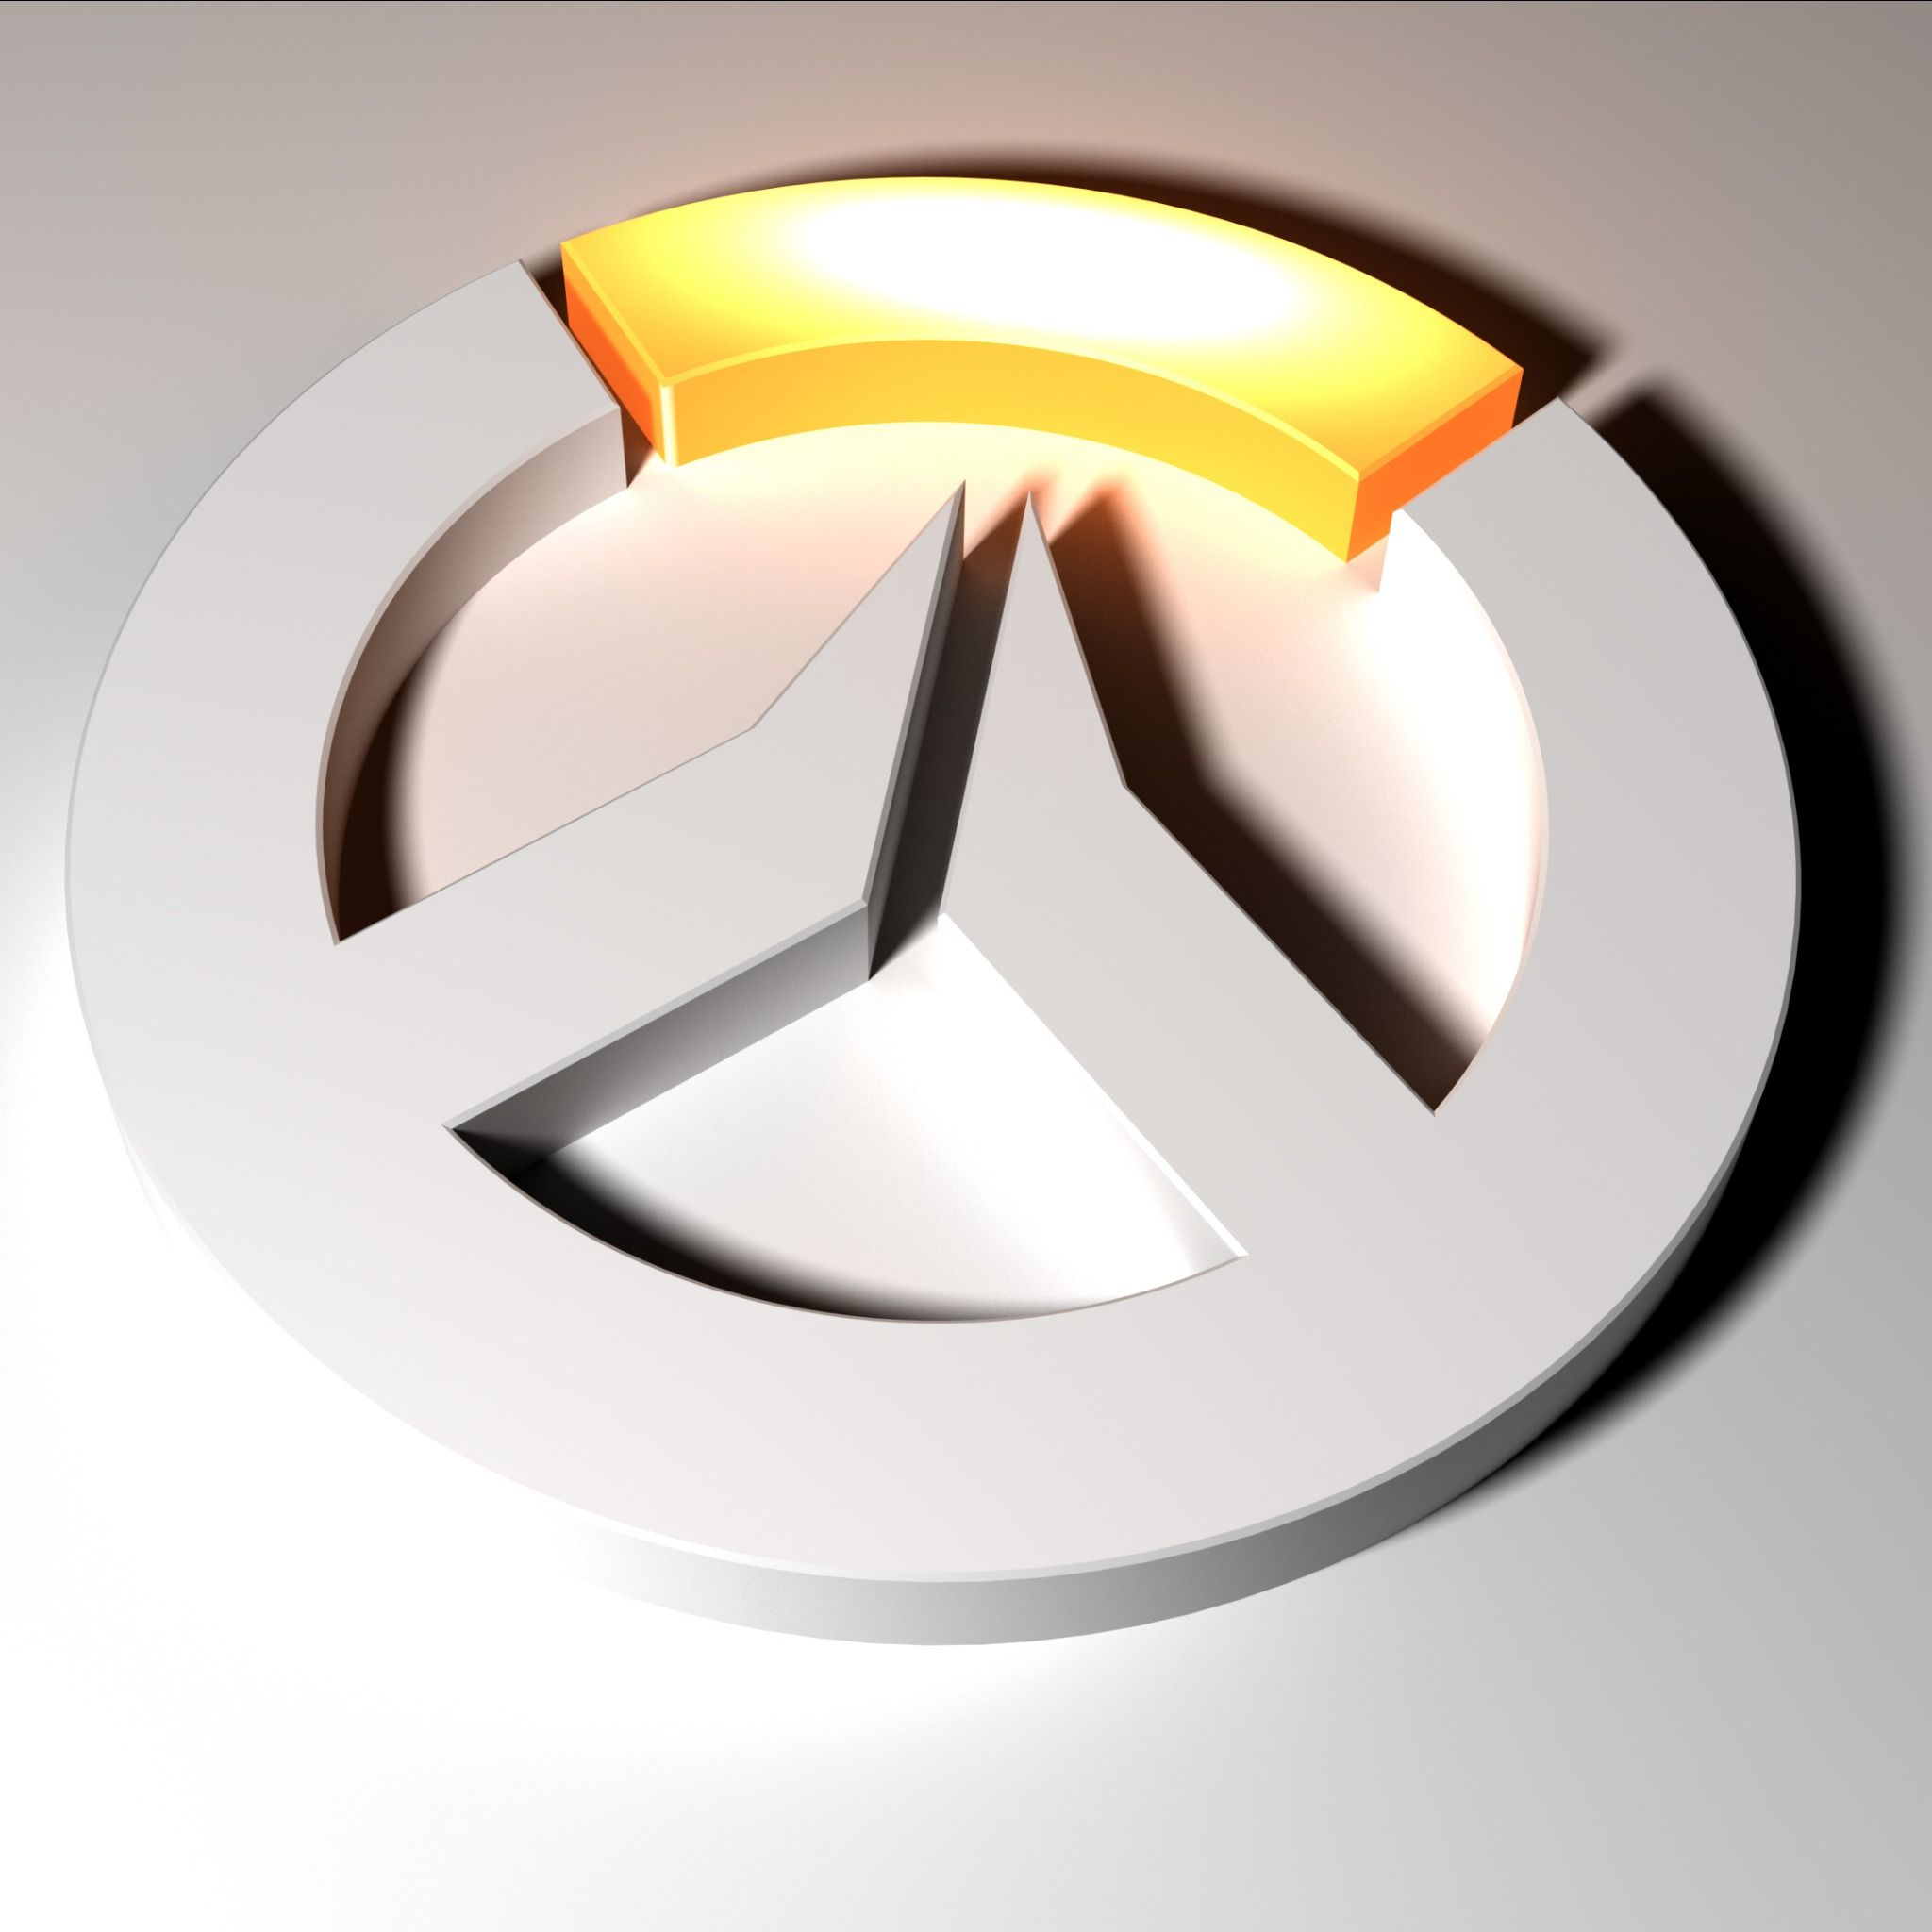 Overwatch Logo Overwatch Wallpapers Overwatch Movie Game